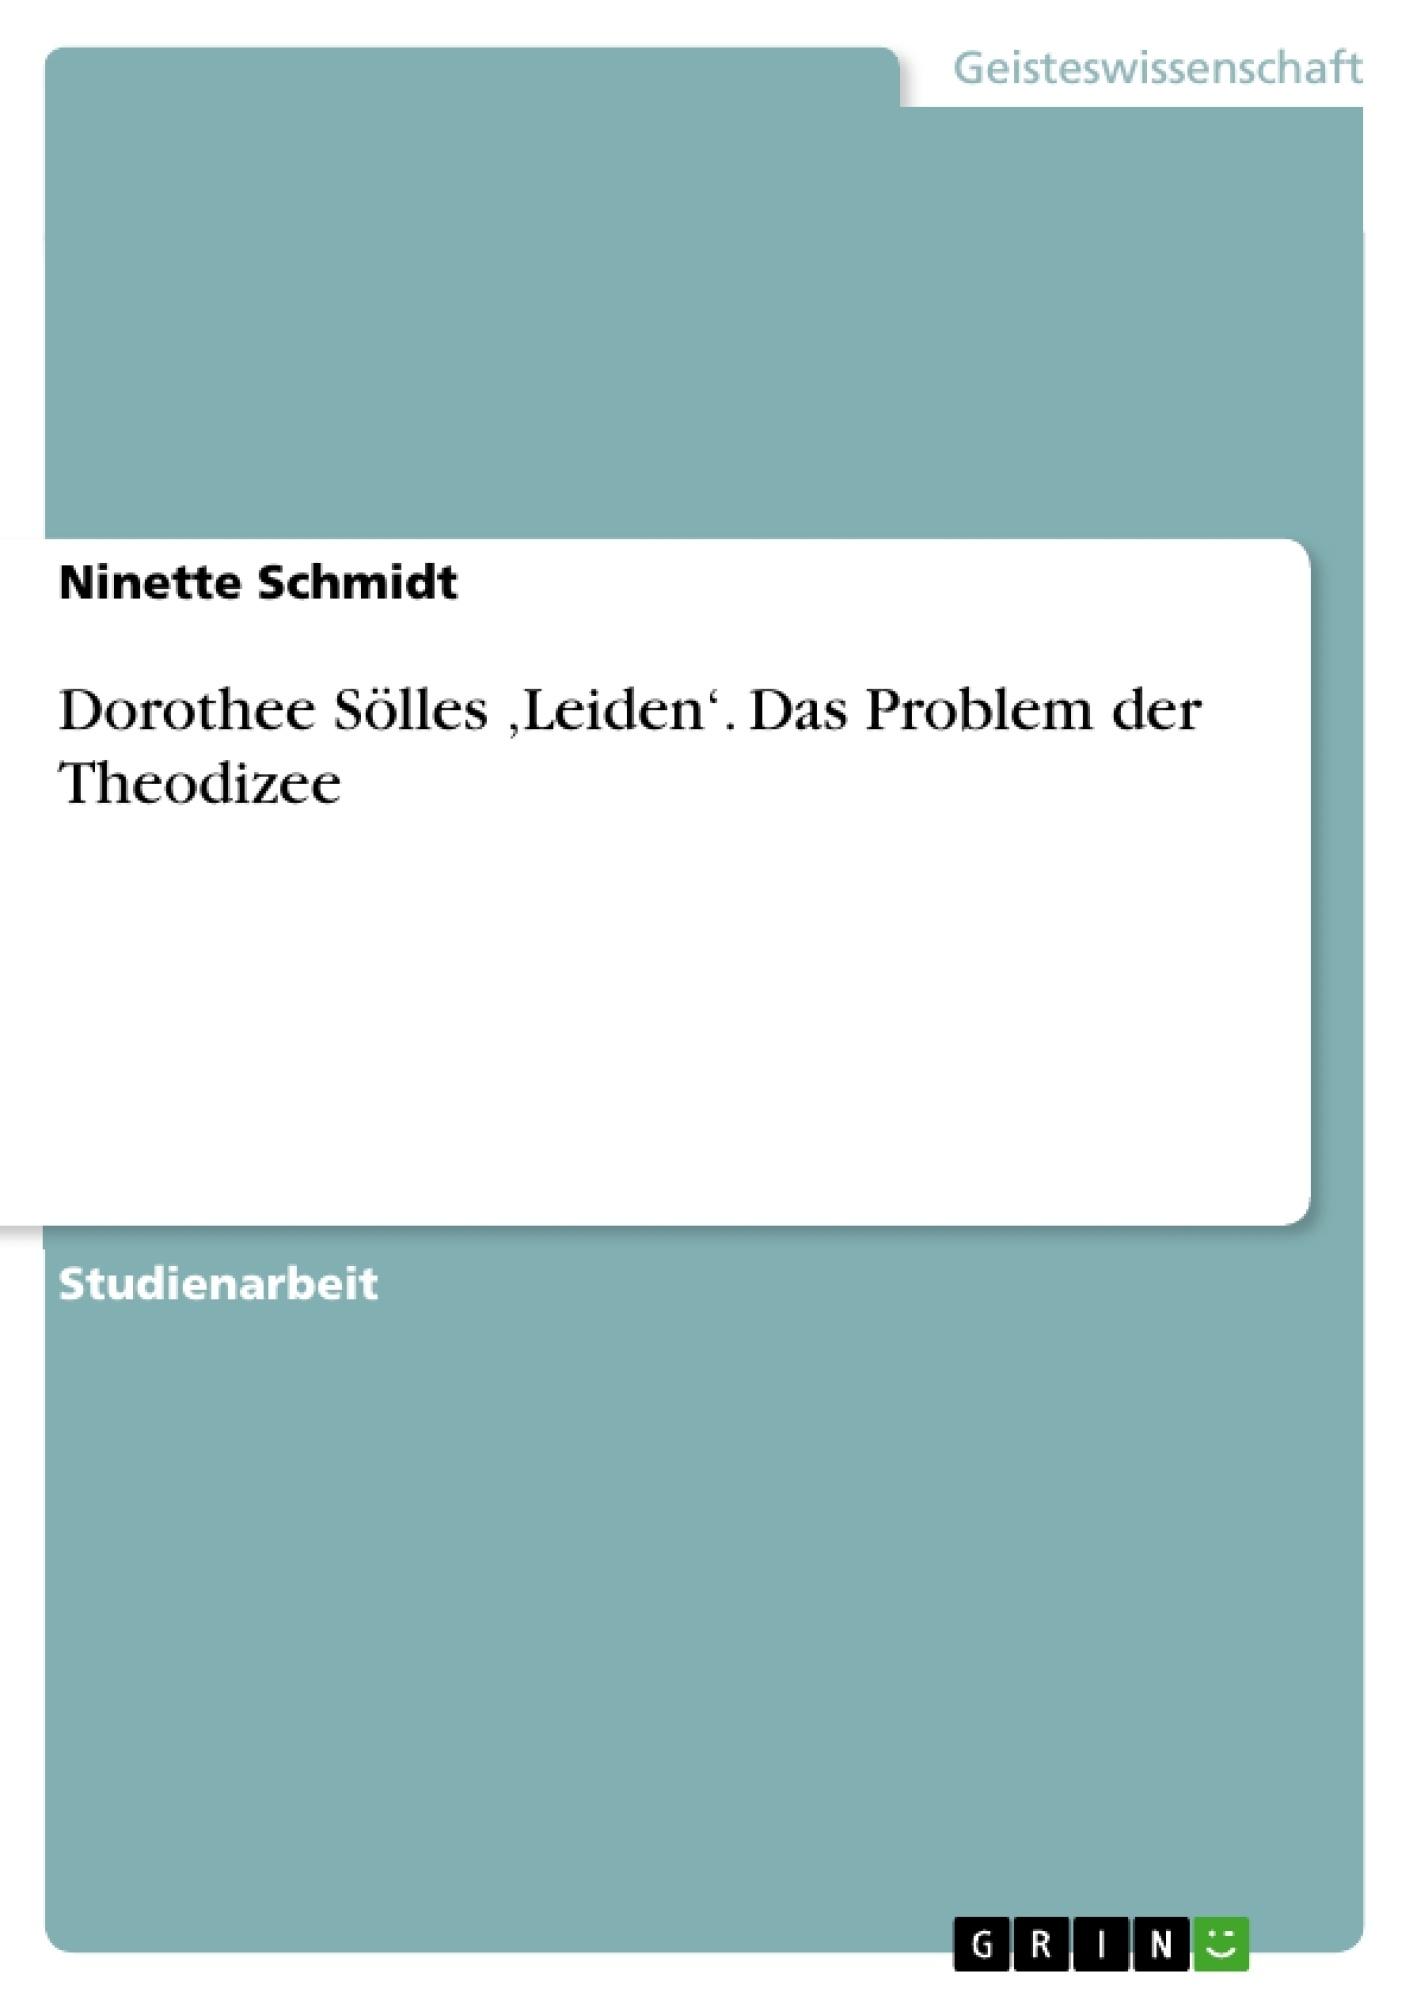 Titel: Dorothee Sölles 'Leiden'. Das Problem der Theodizee